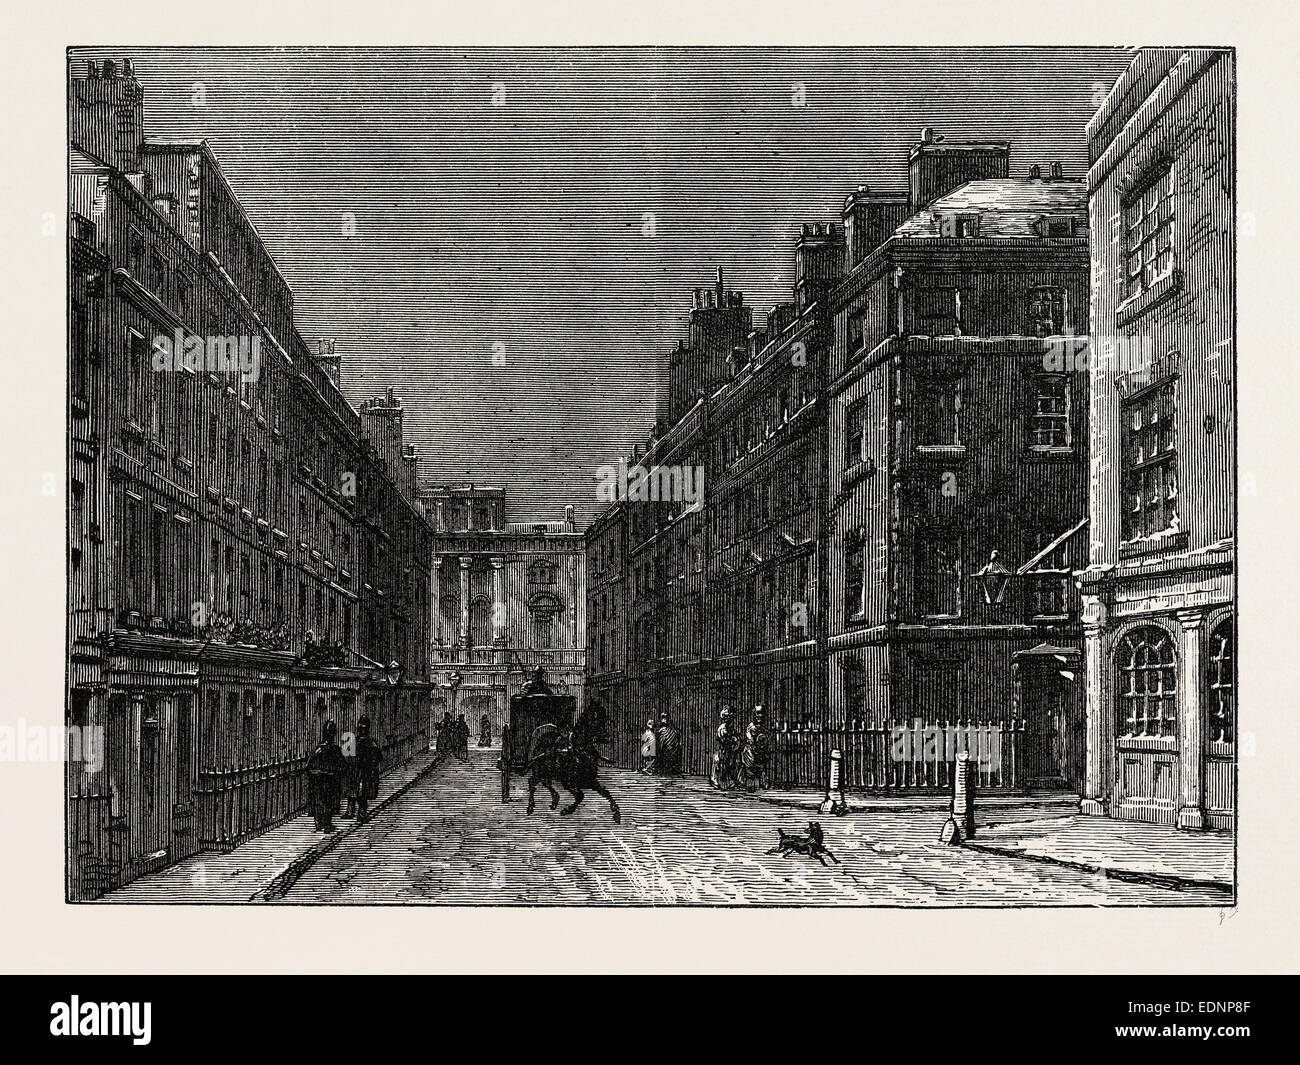 BURY STREET. London, UK, 19th century engraving - Stock Image